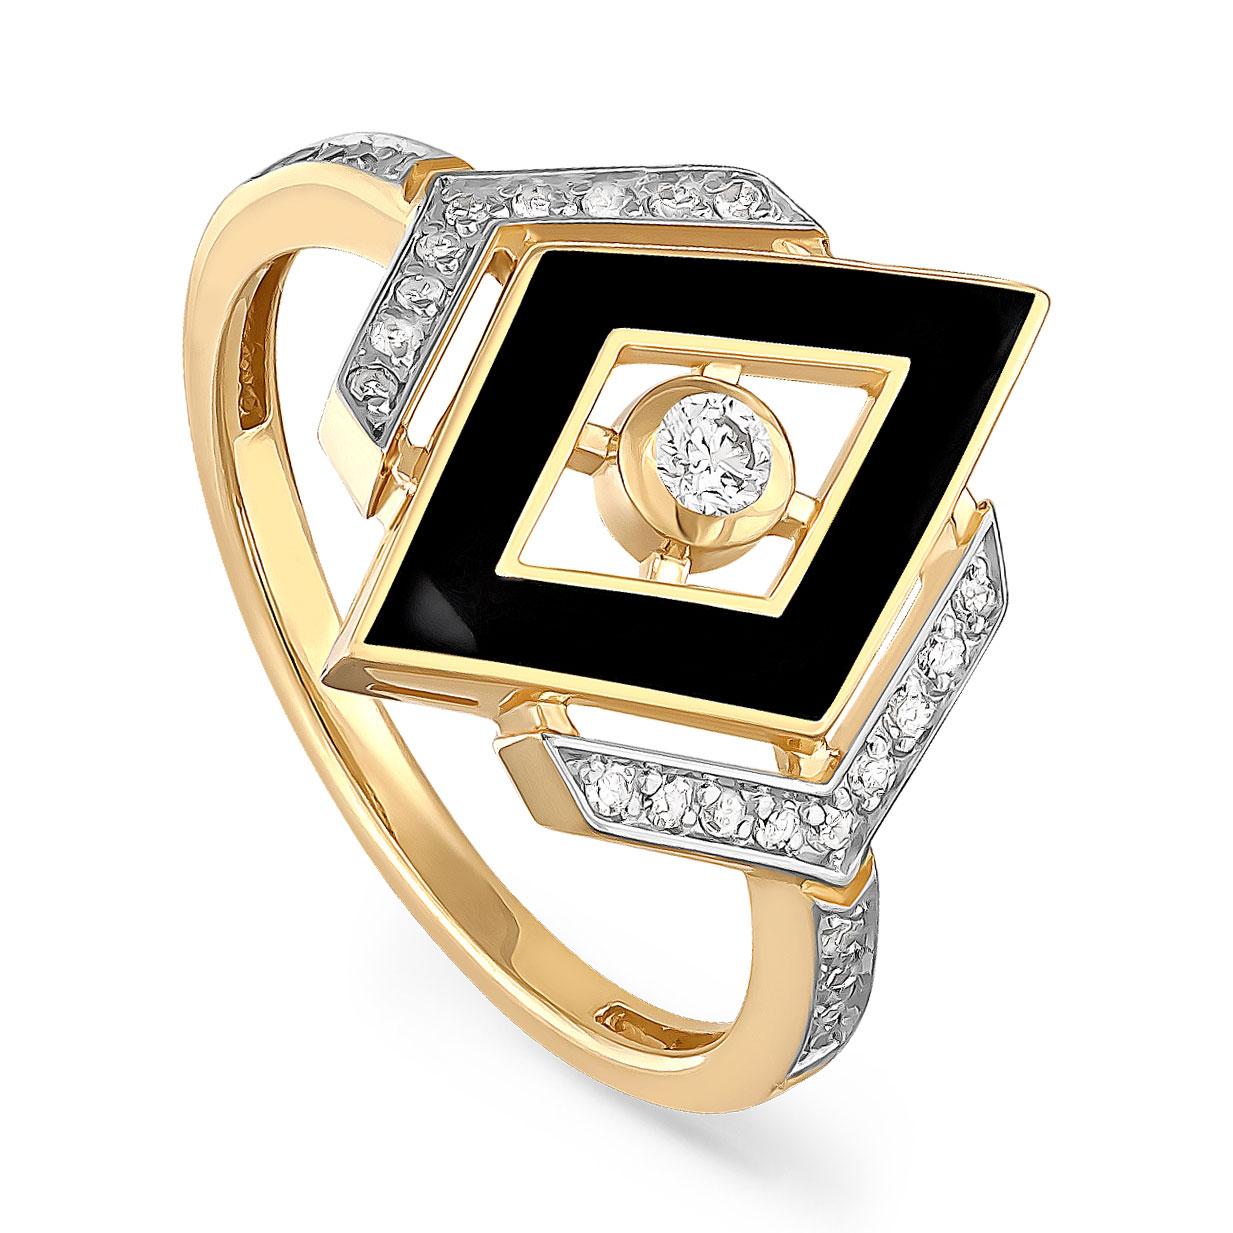 Кольцо из лимонного золота Бриллиант арт. 11-21044-1002 11-21044-1002